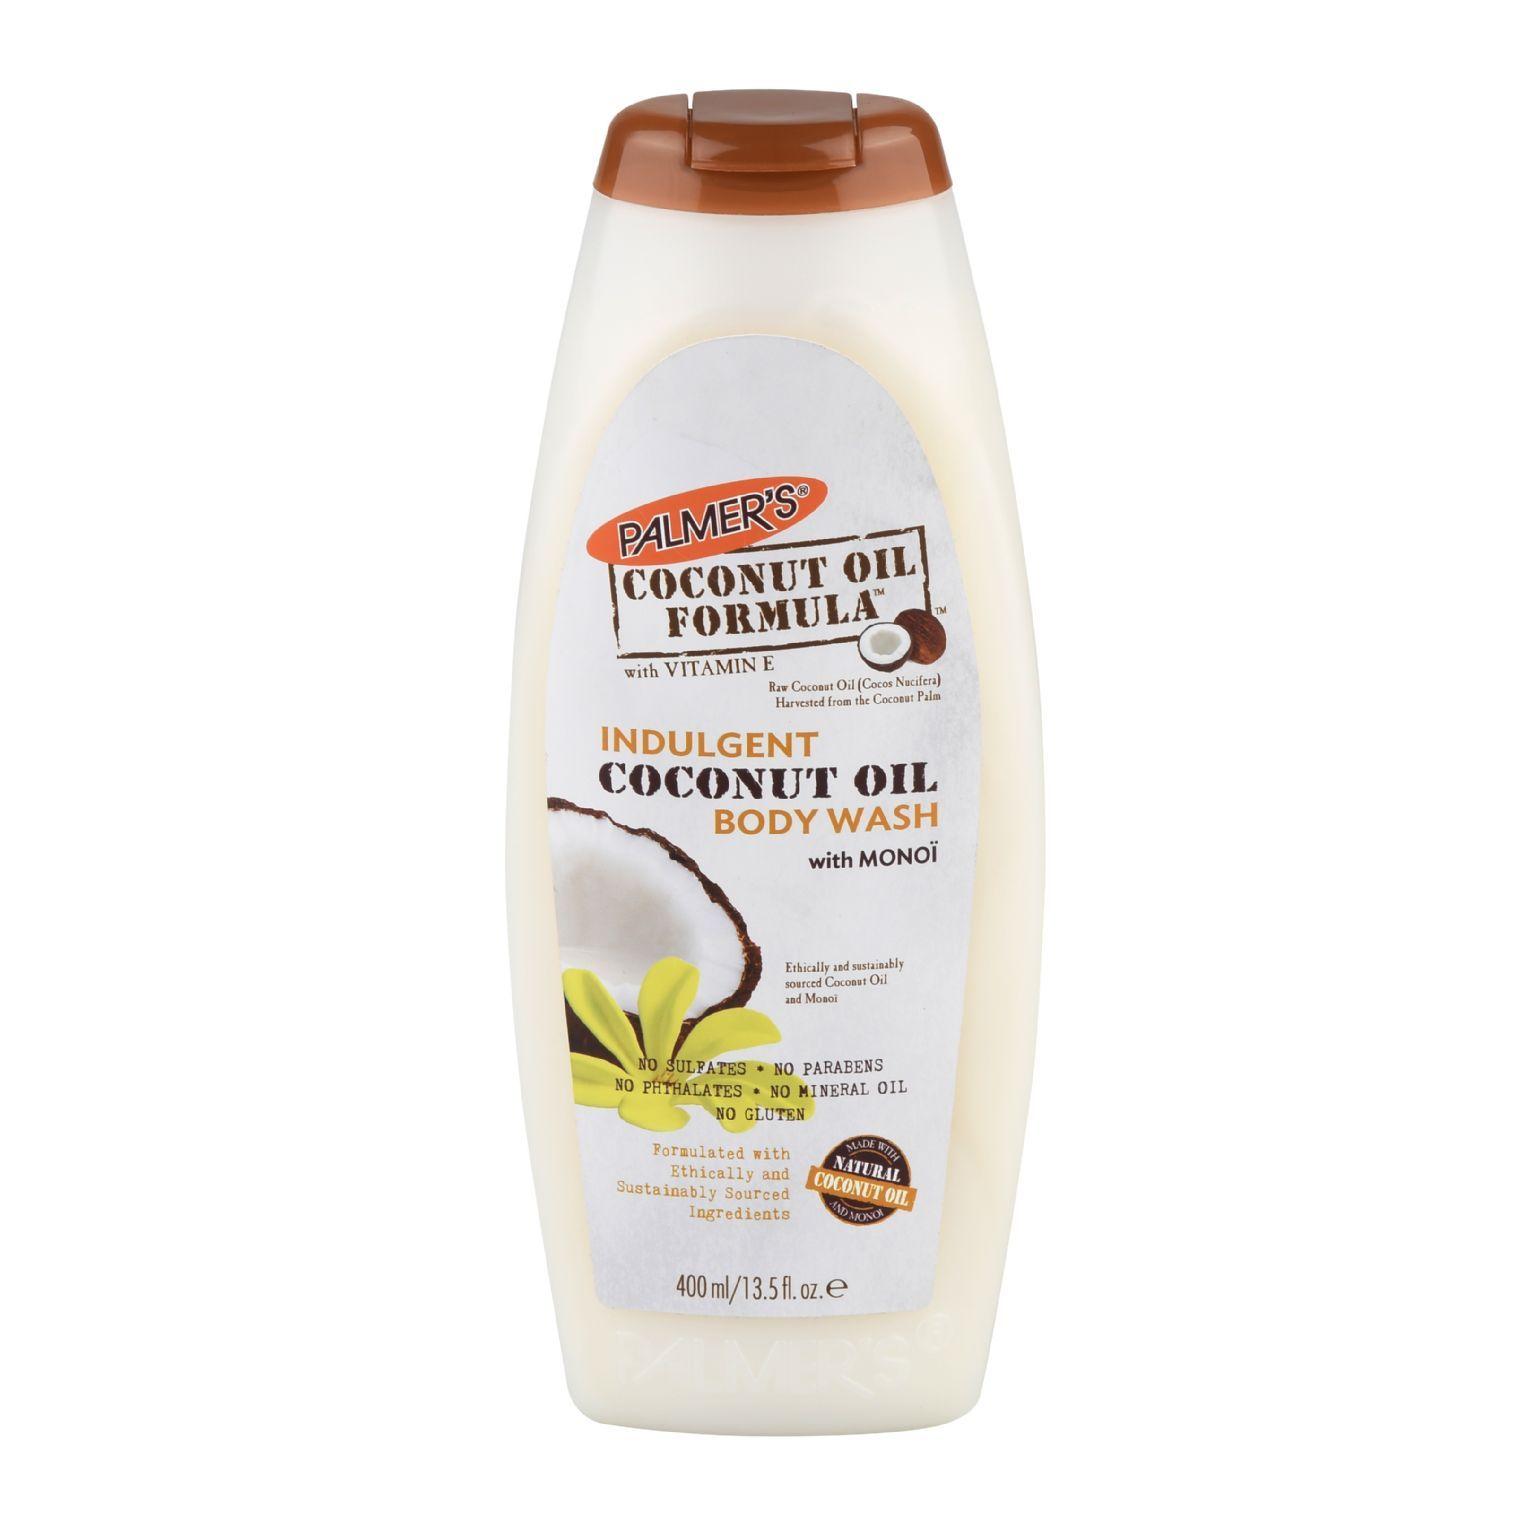 Indulget Coconut Oil Body Wash